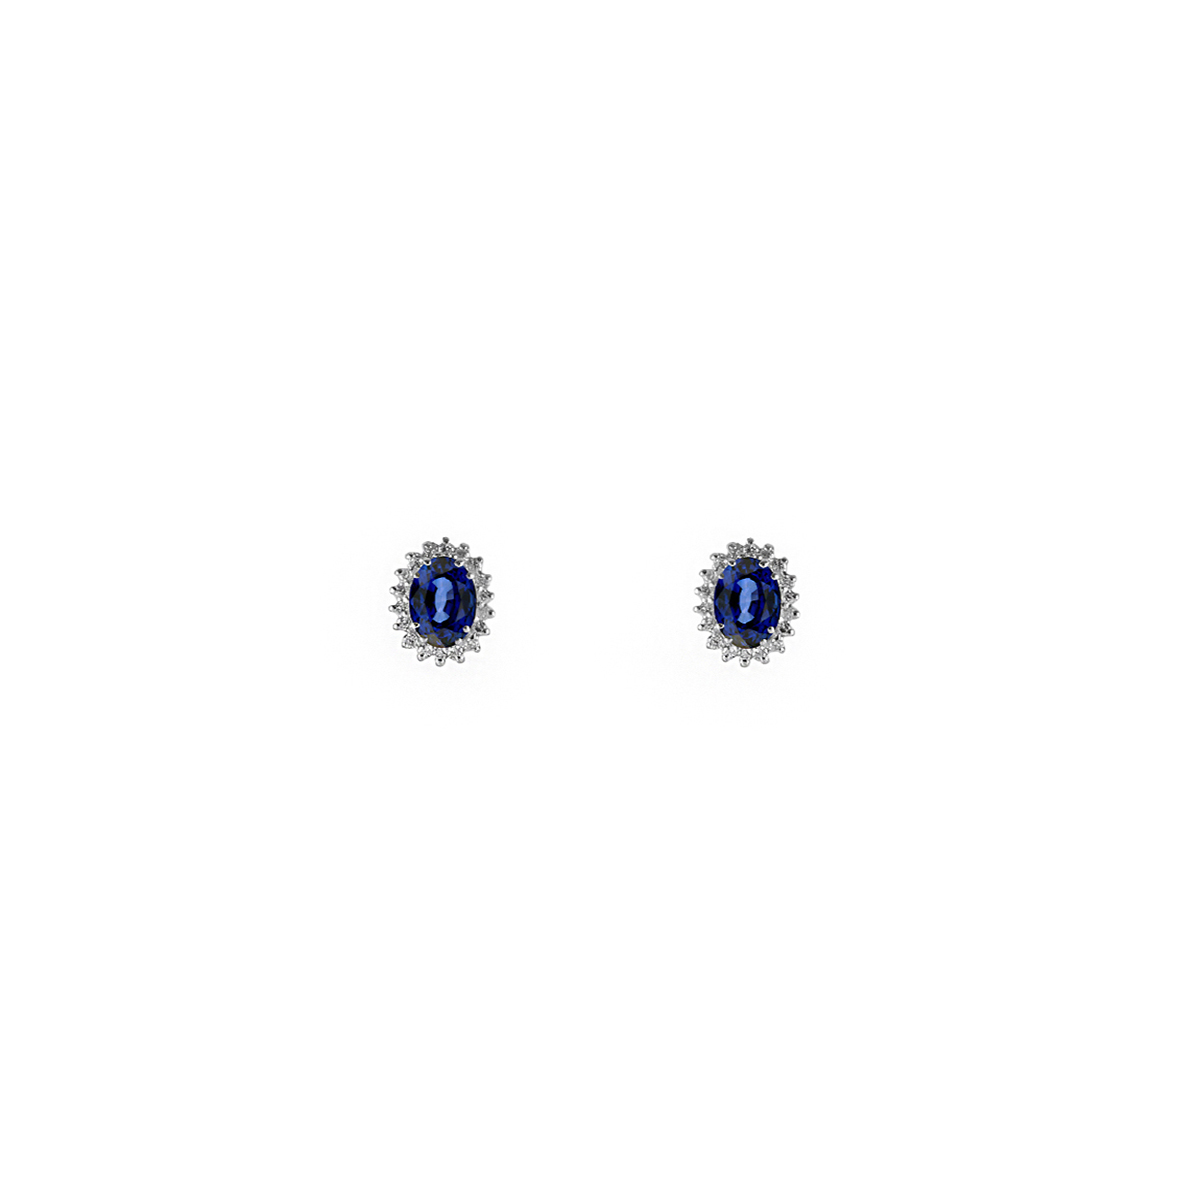 orecchini zaffiri e diamanti  orz010-011